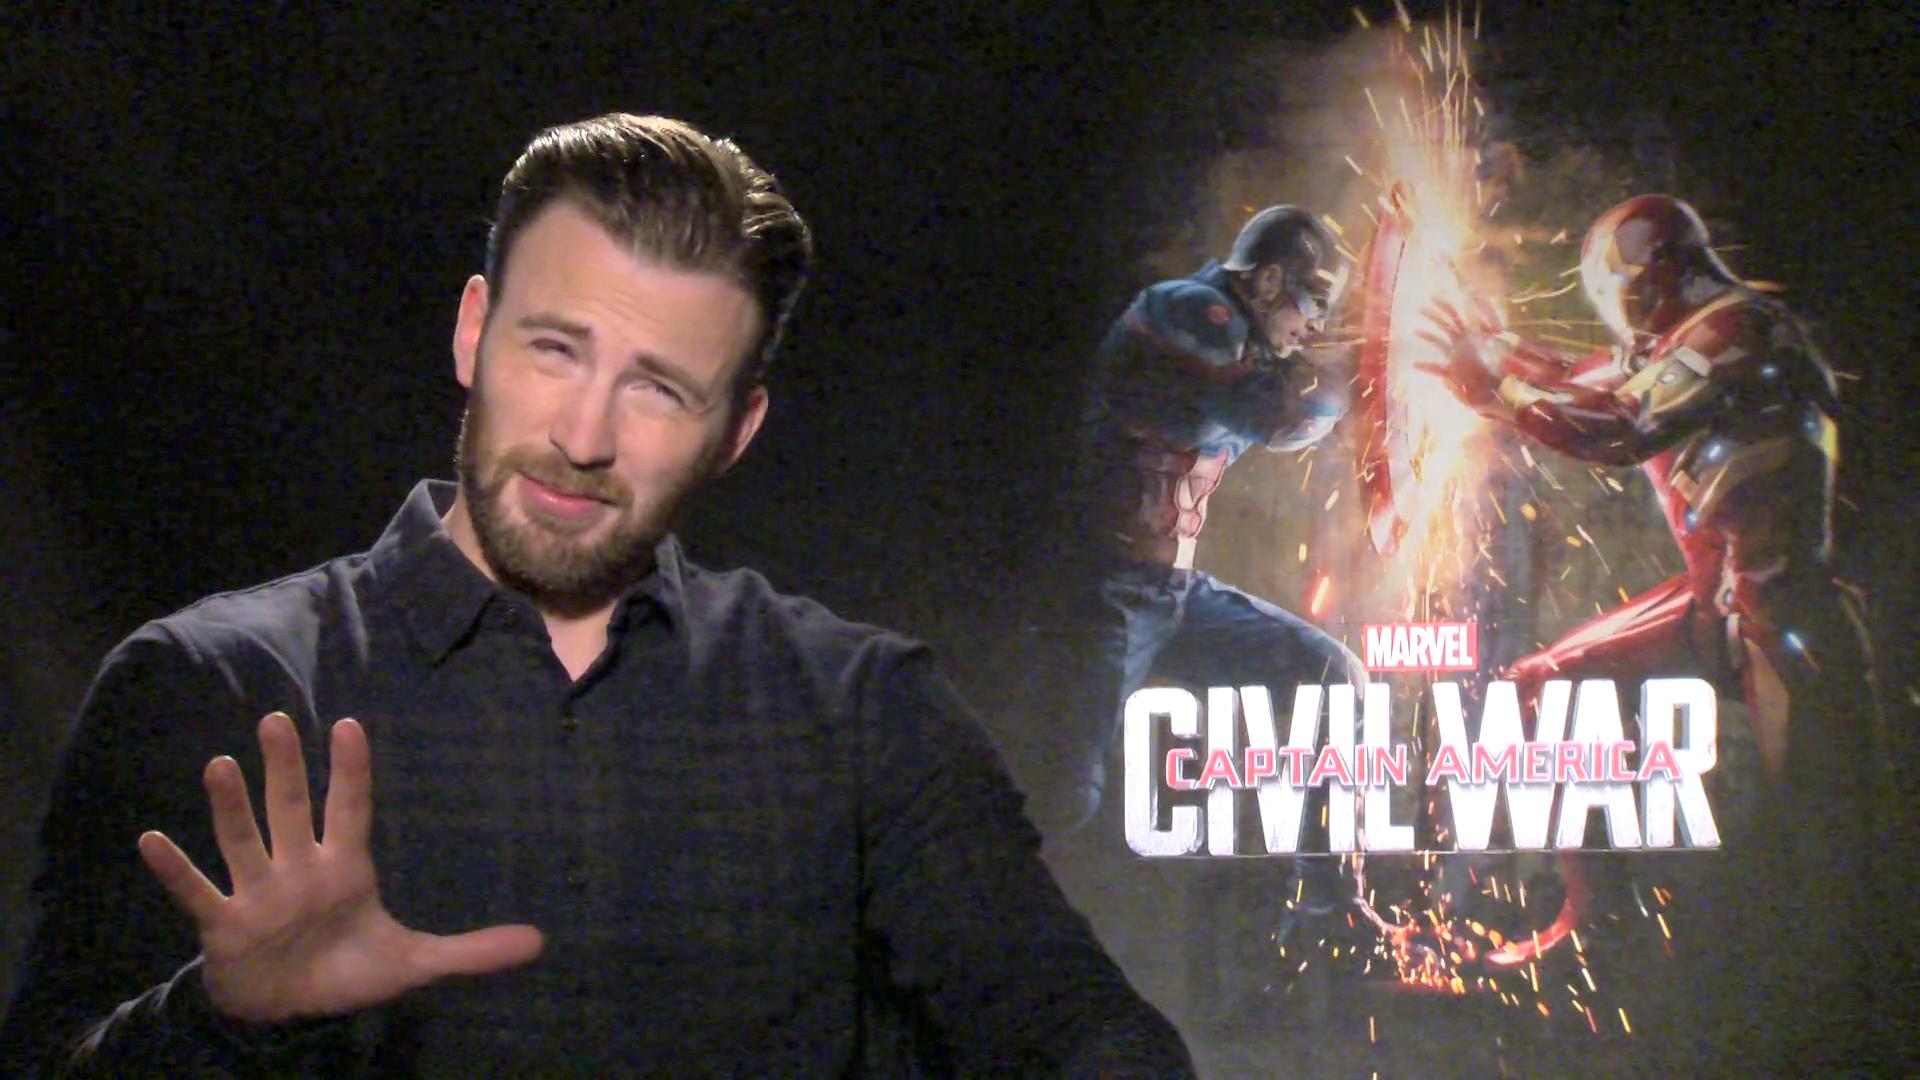 S.H.I.E.L.D. or Shield With Captain America: Civil War's Chris Evans